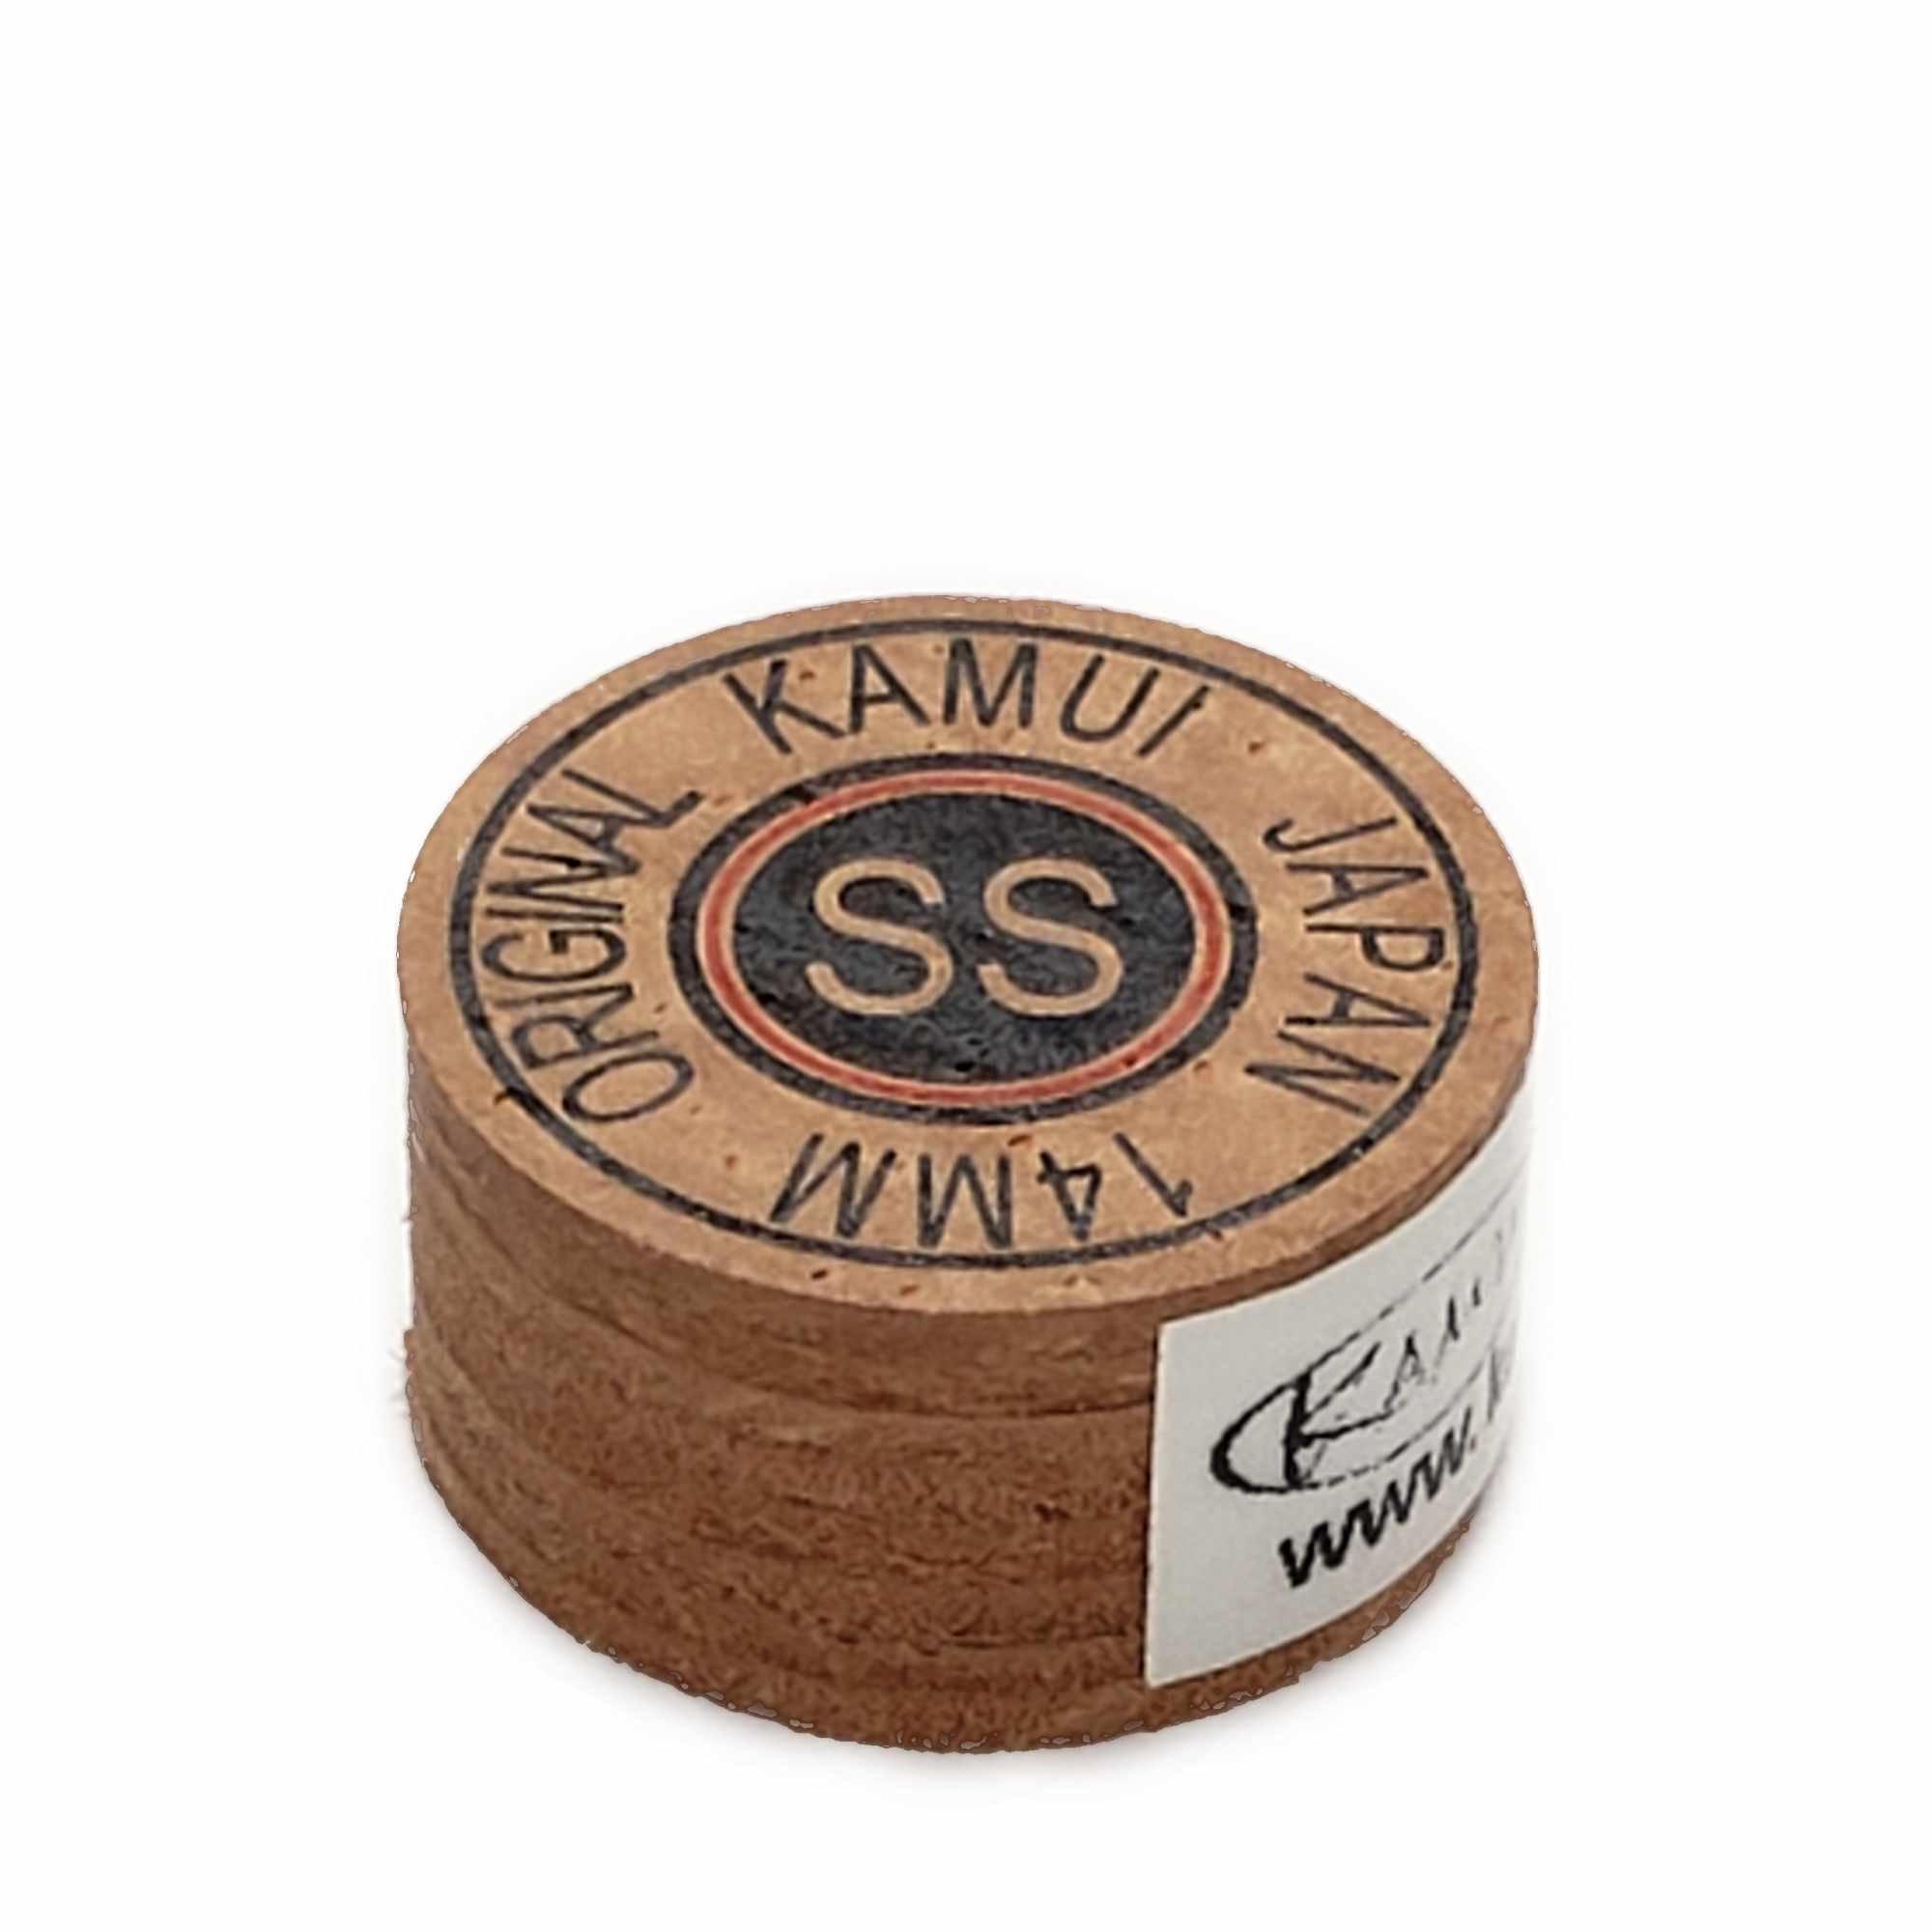 KAMUI original SS